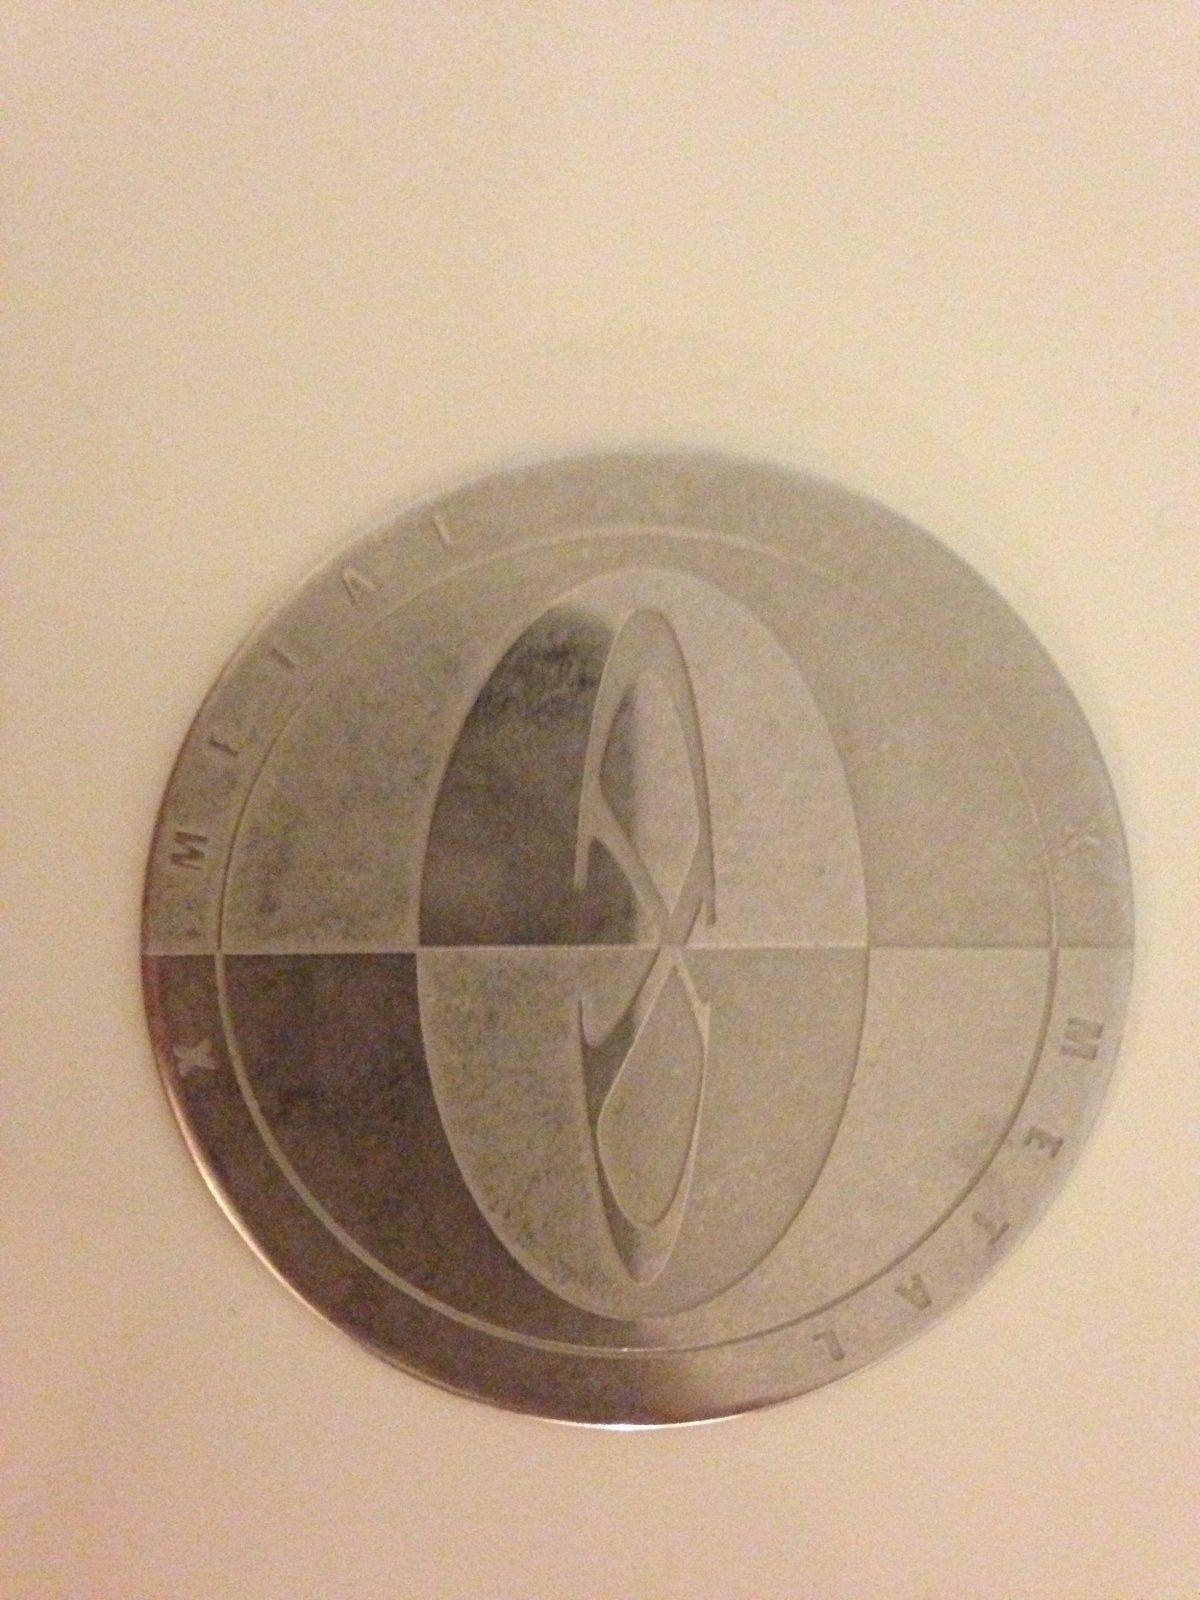 Romeo 1 Coin 1997 - photo 2.JPG